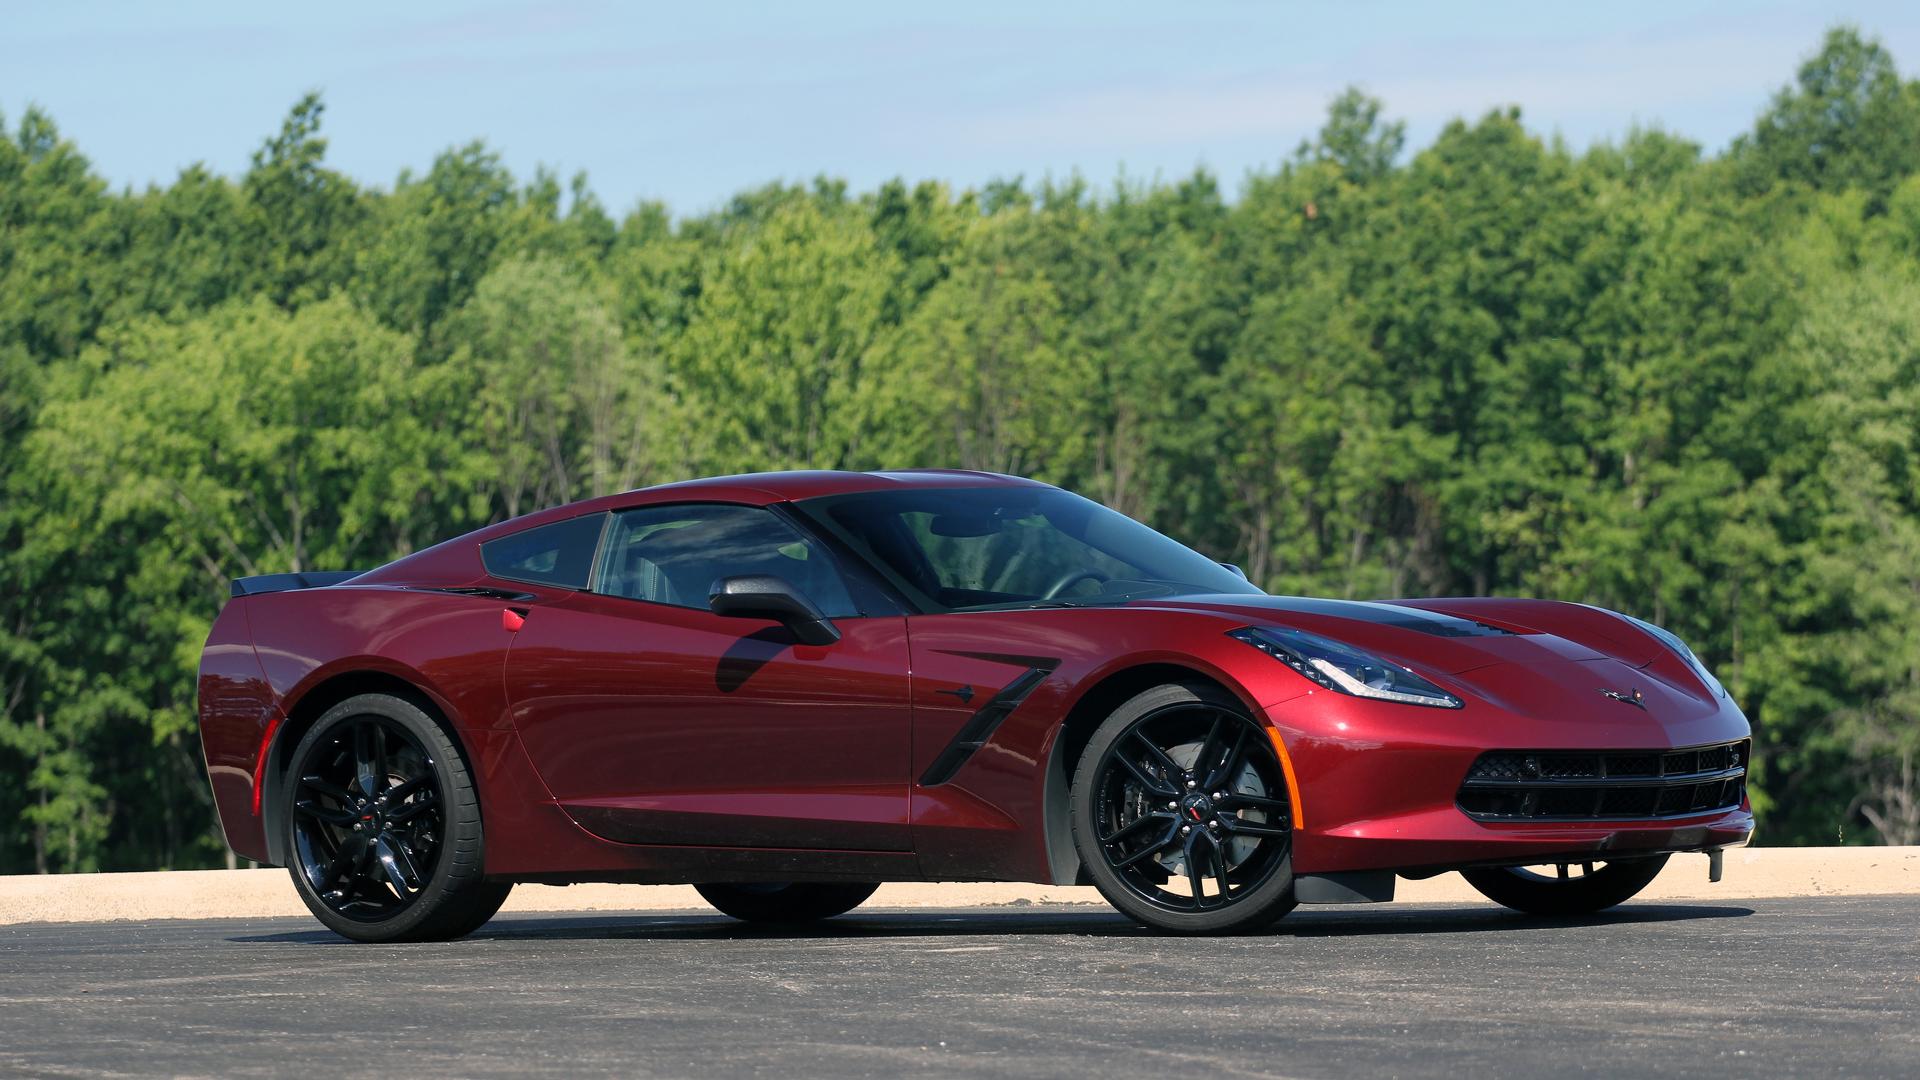 review 2016 chevy corvette stingray. Black Bedroom Furniture Sets. Home Design Ideas